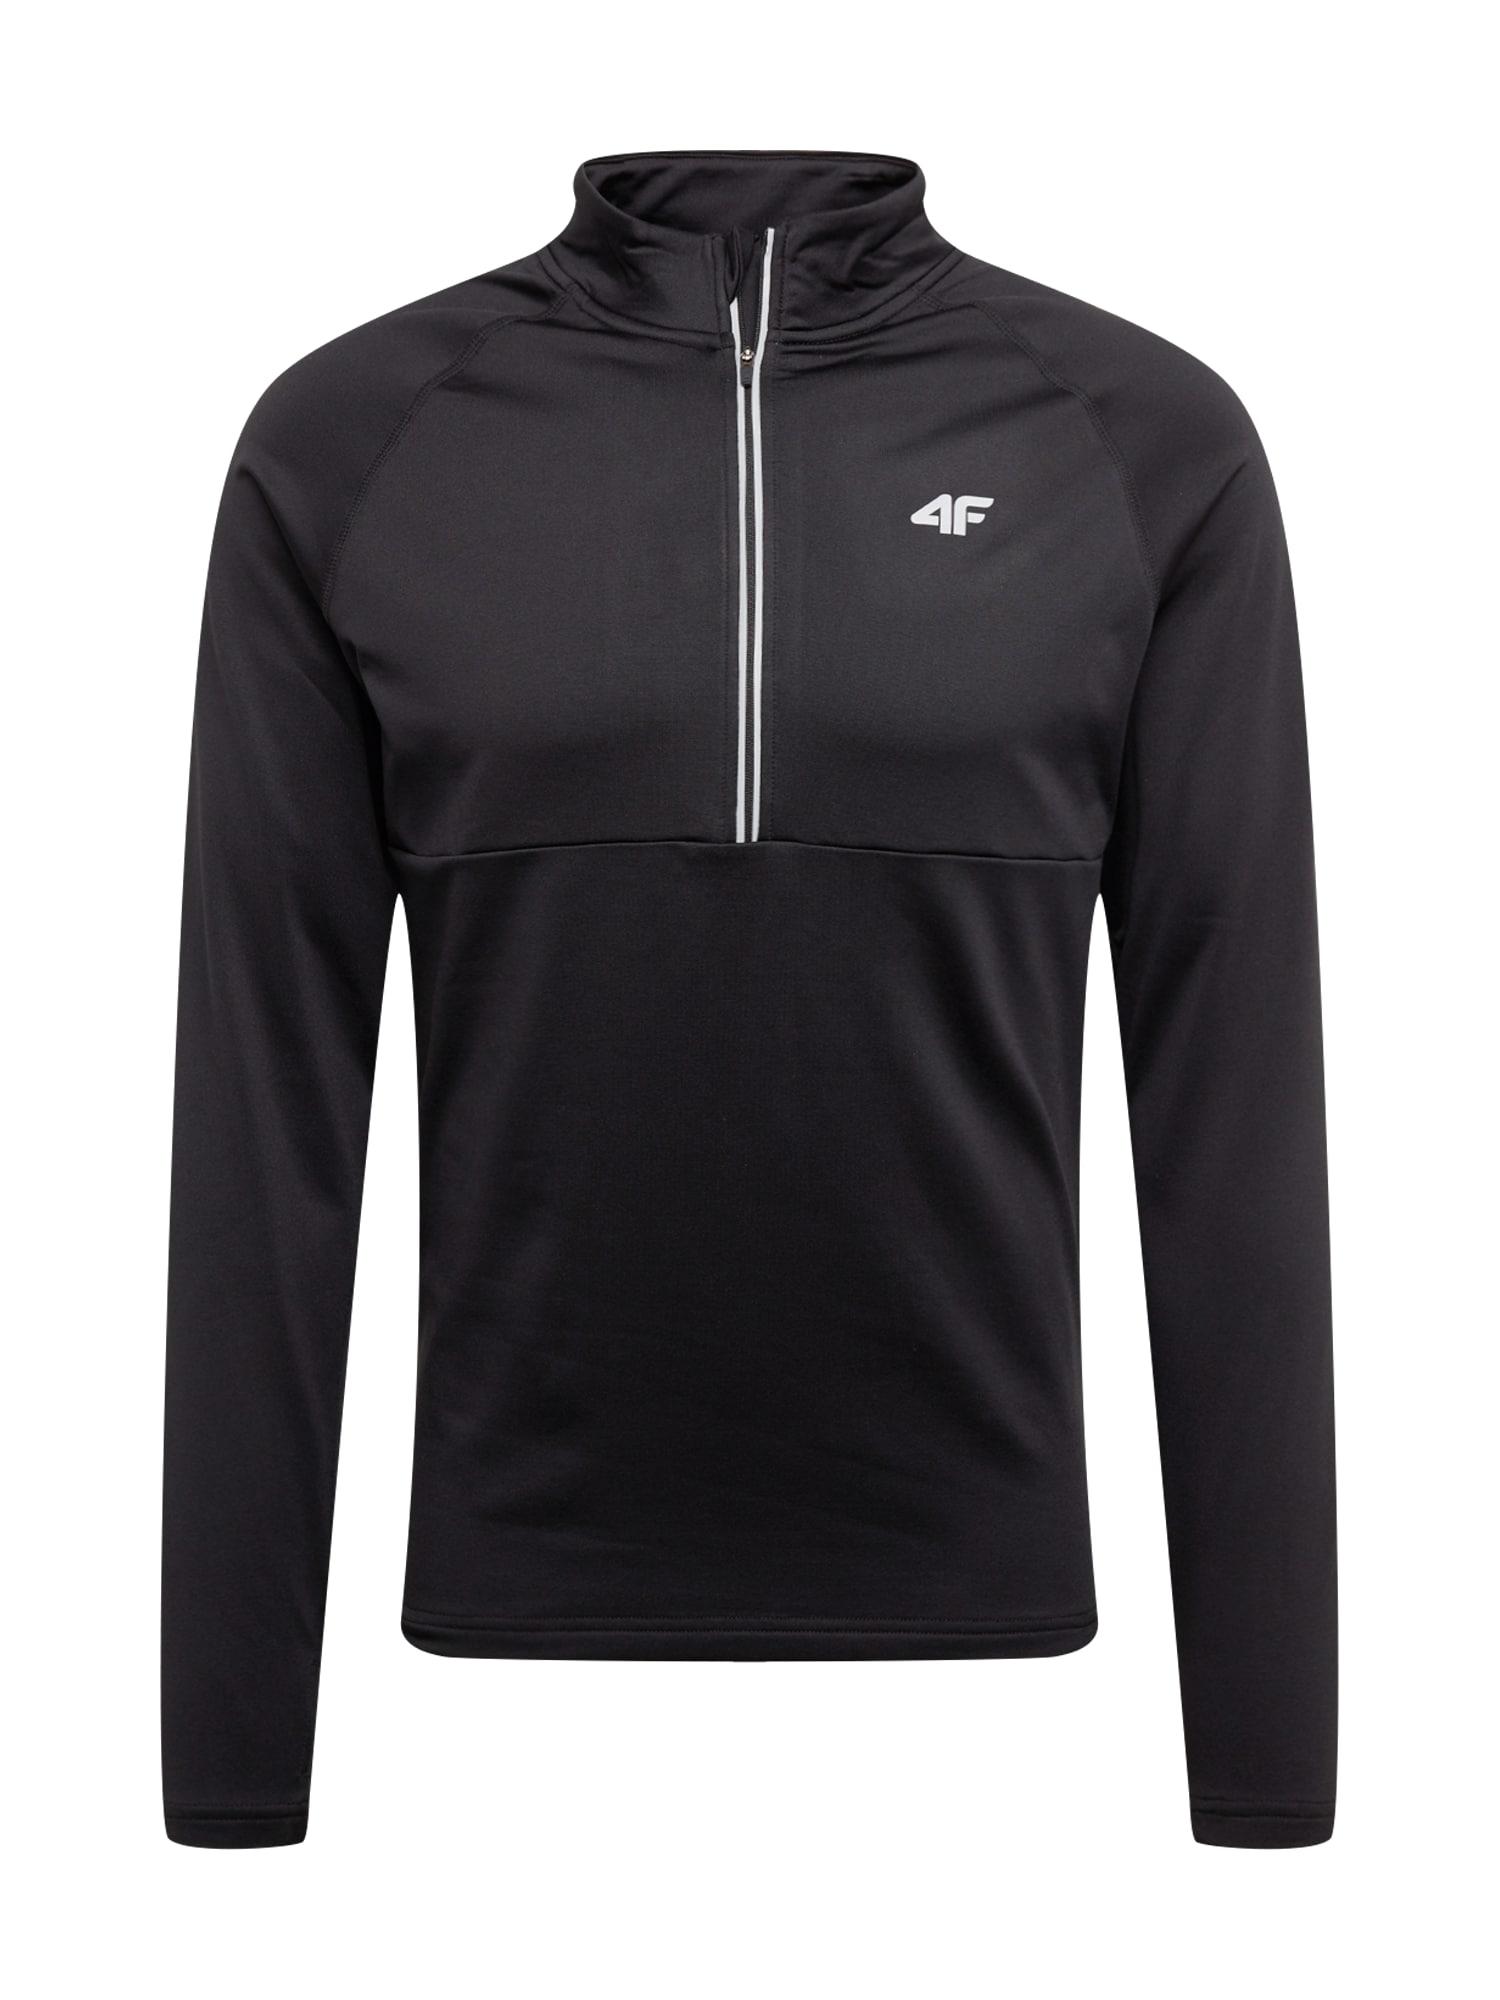 4F Sportinio tipo megztinis juoda / balta